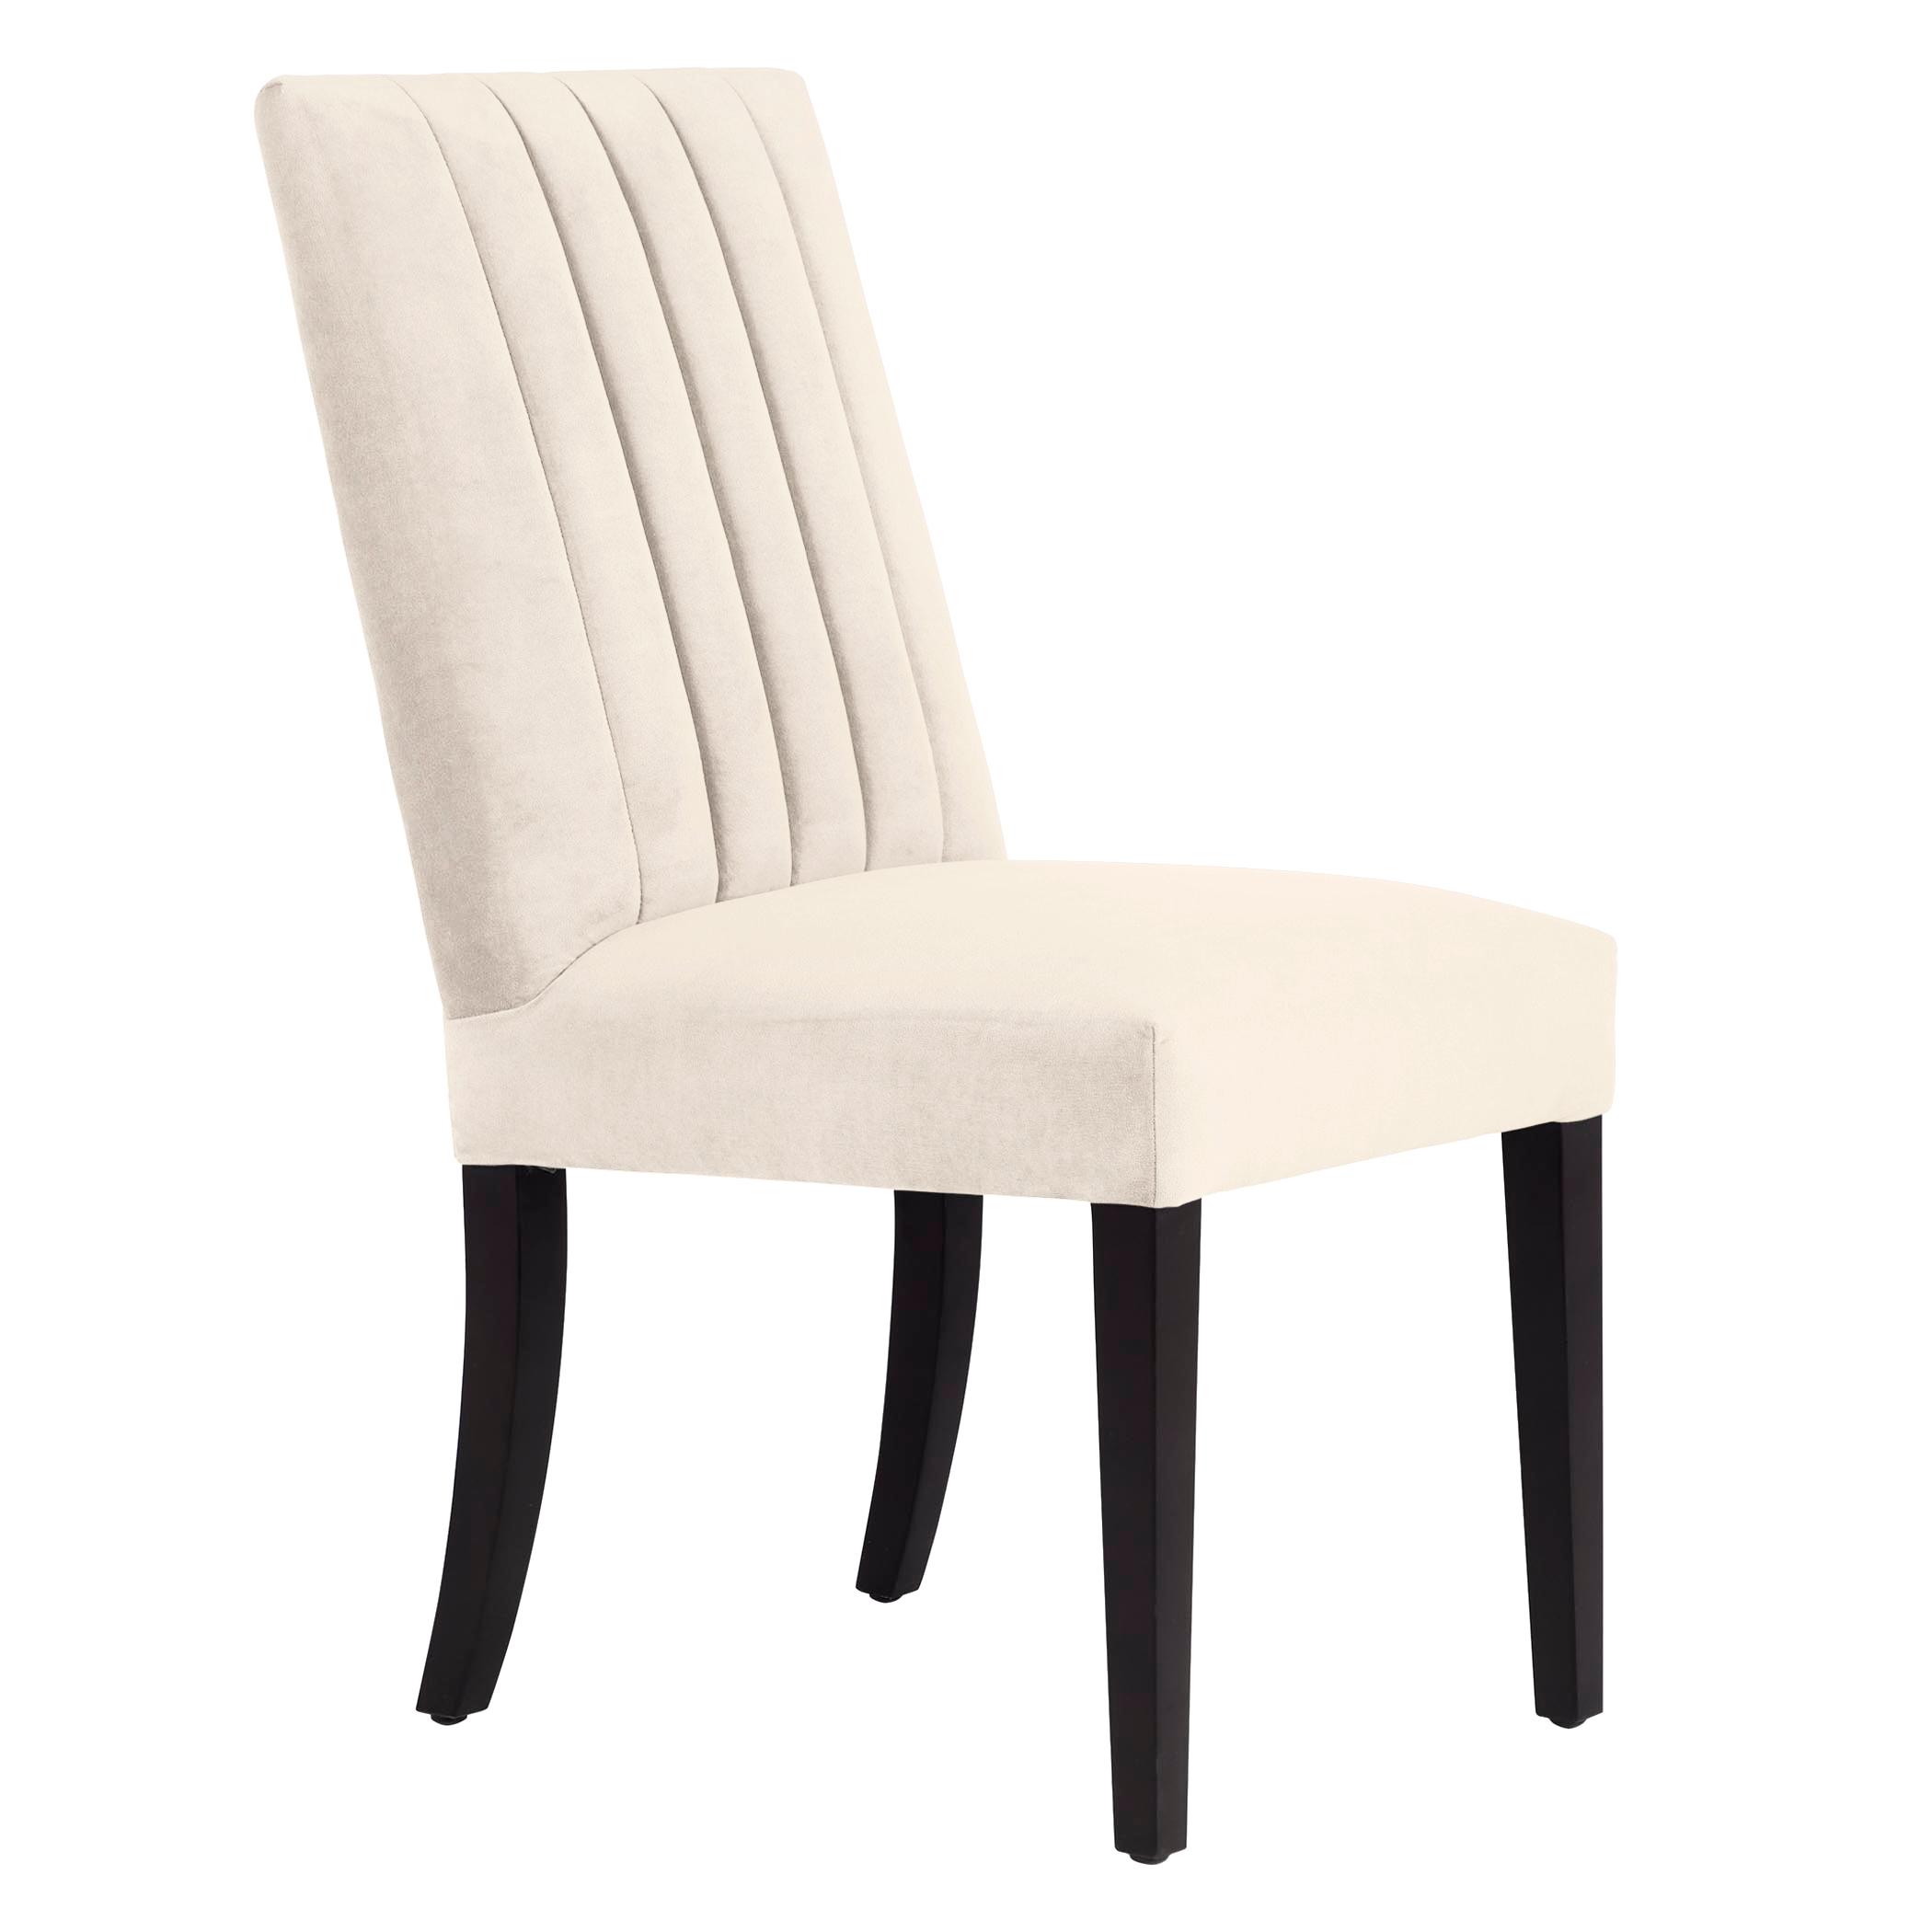 Easton Dining Chair - Espresso